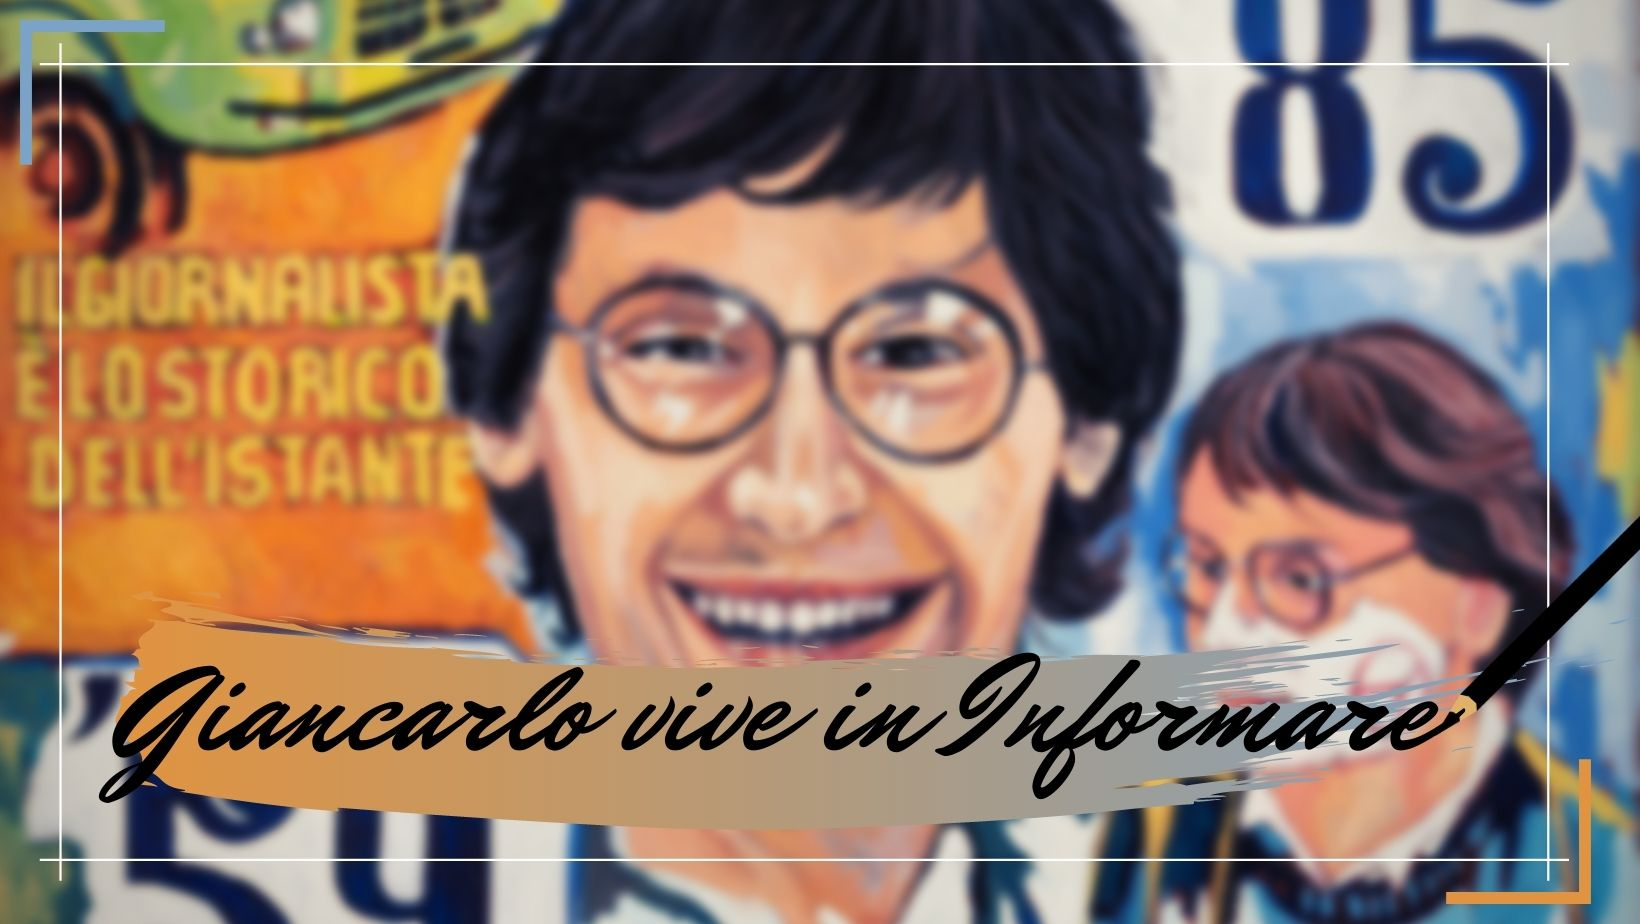 informareonline-giancarlo-vive-in-informare